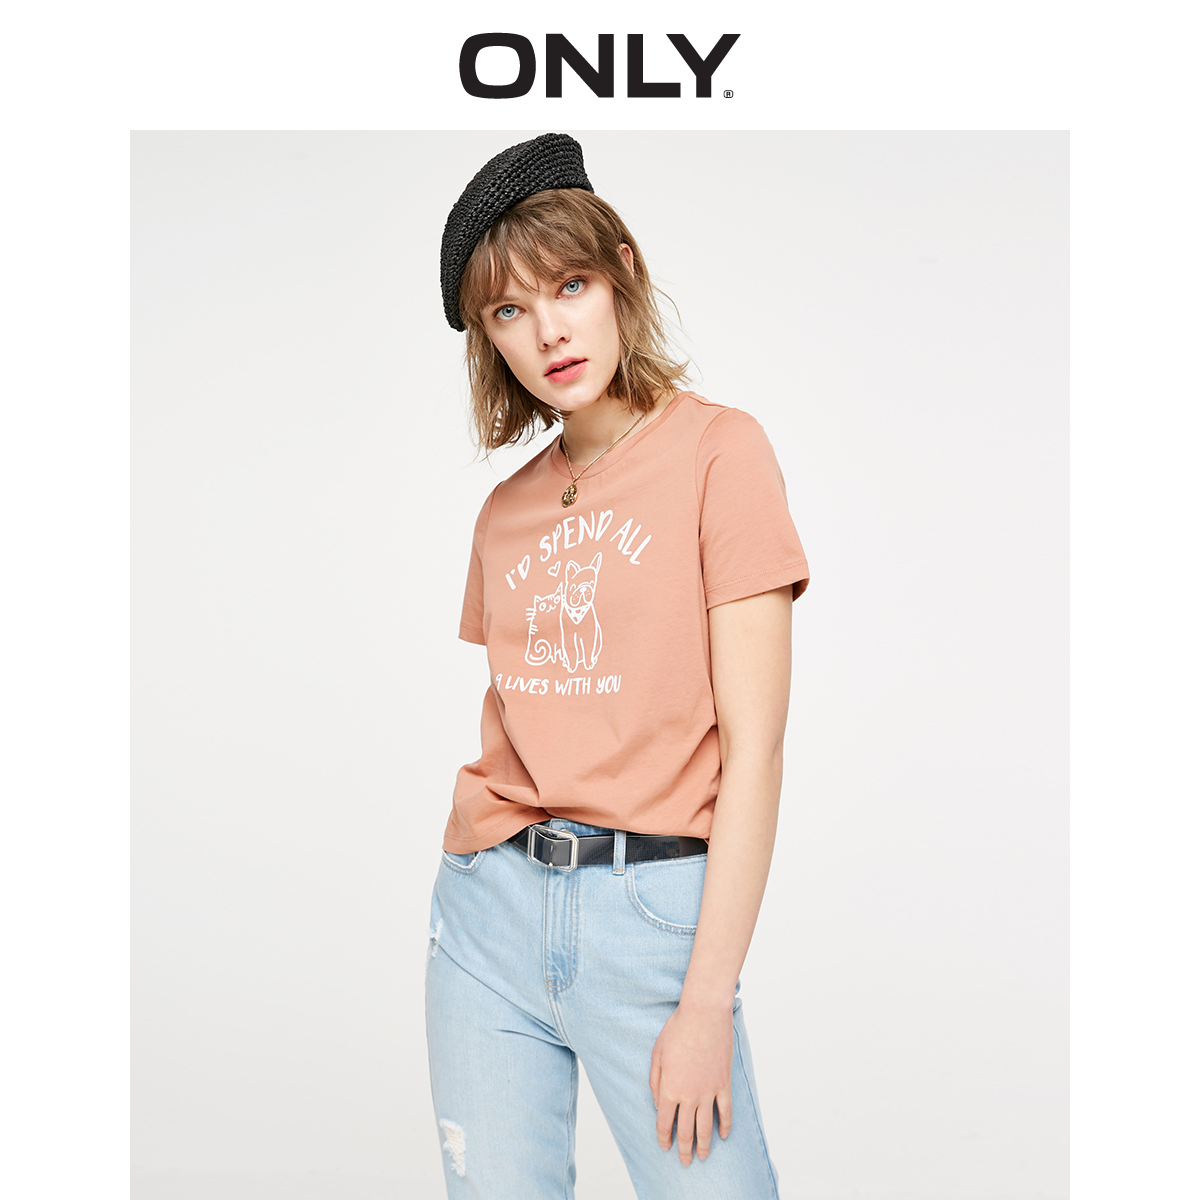 ONLY Women's Cartoon Pattern Loose Fit Round Neckline Short-sleeved T-shirt 119101636